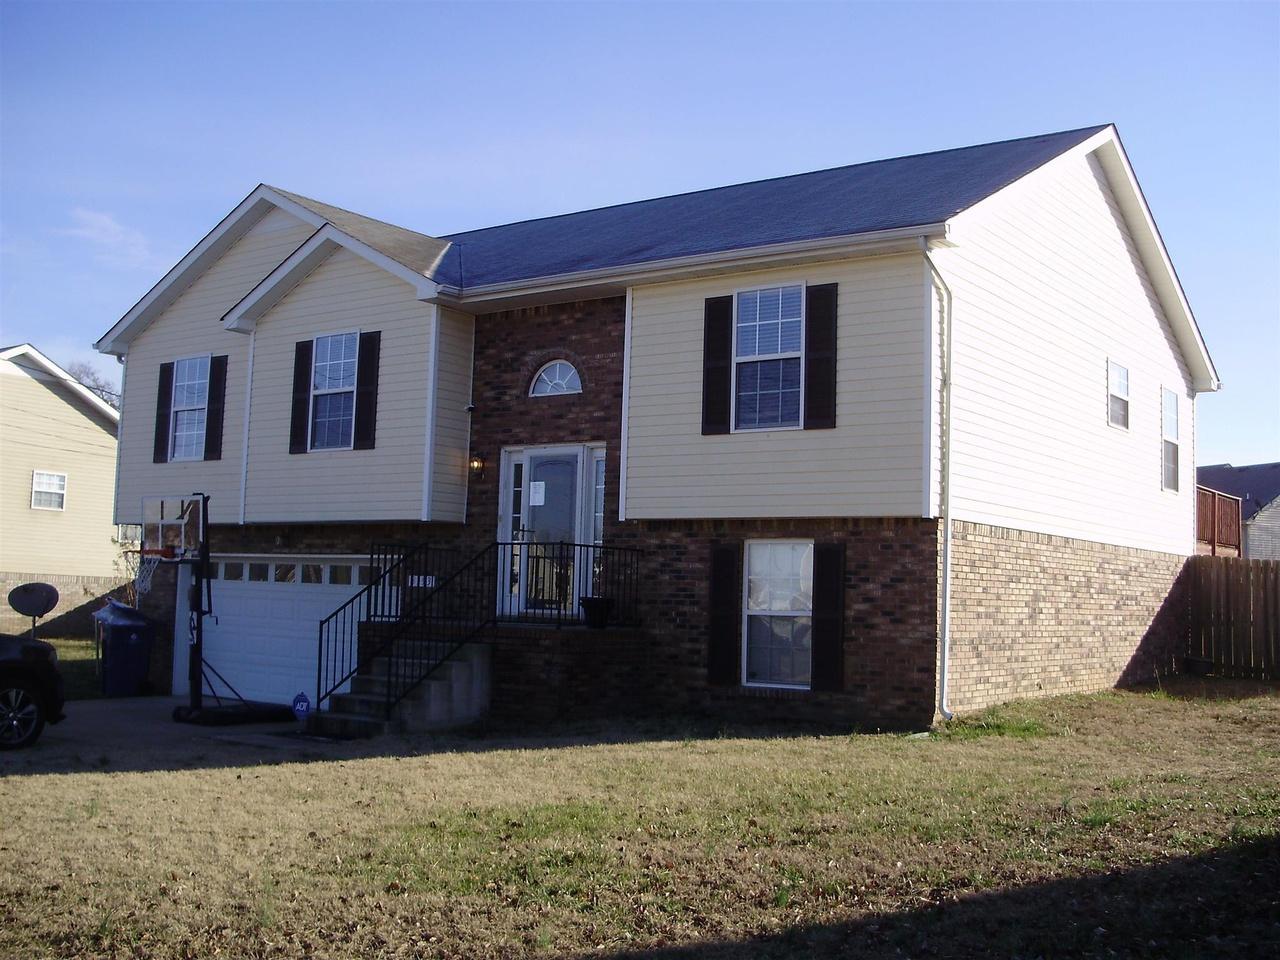 3393 dresden way clarksville tn 37042 mls 1796775 redfin. Black Bedroom Furniture Sets. Home Design Ideas